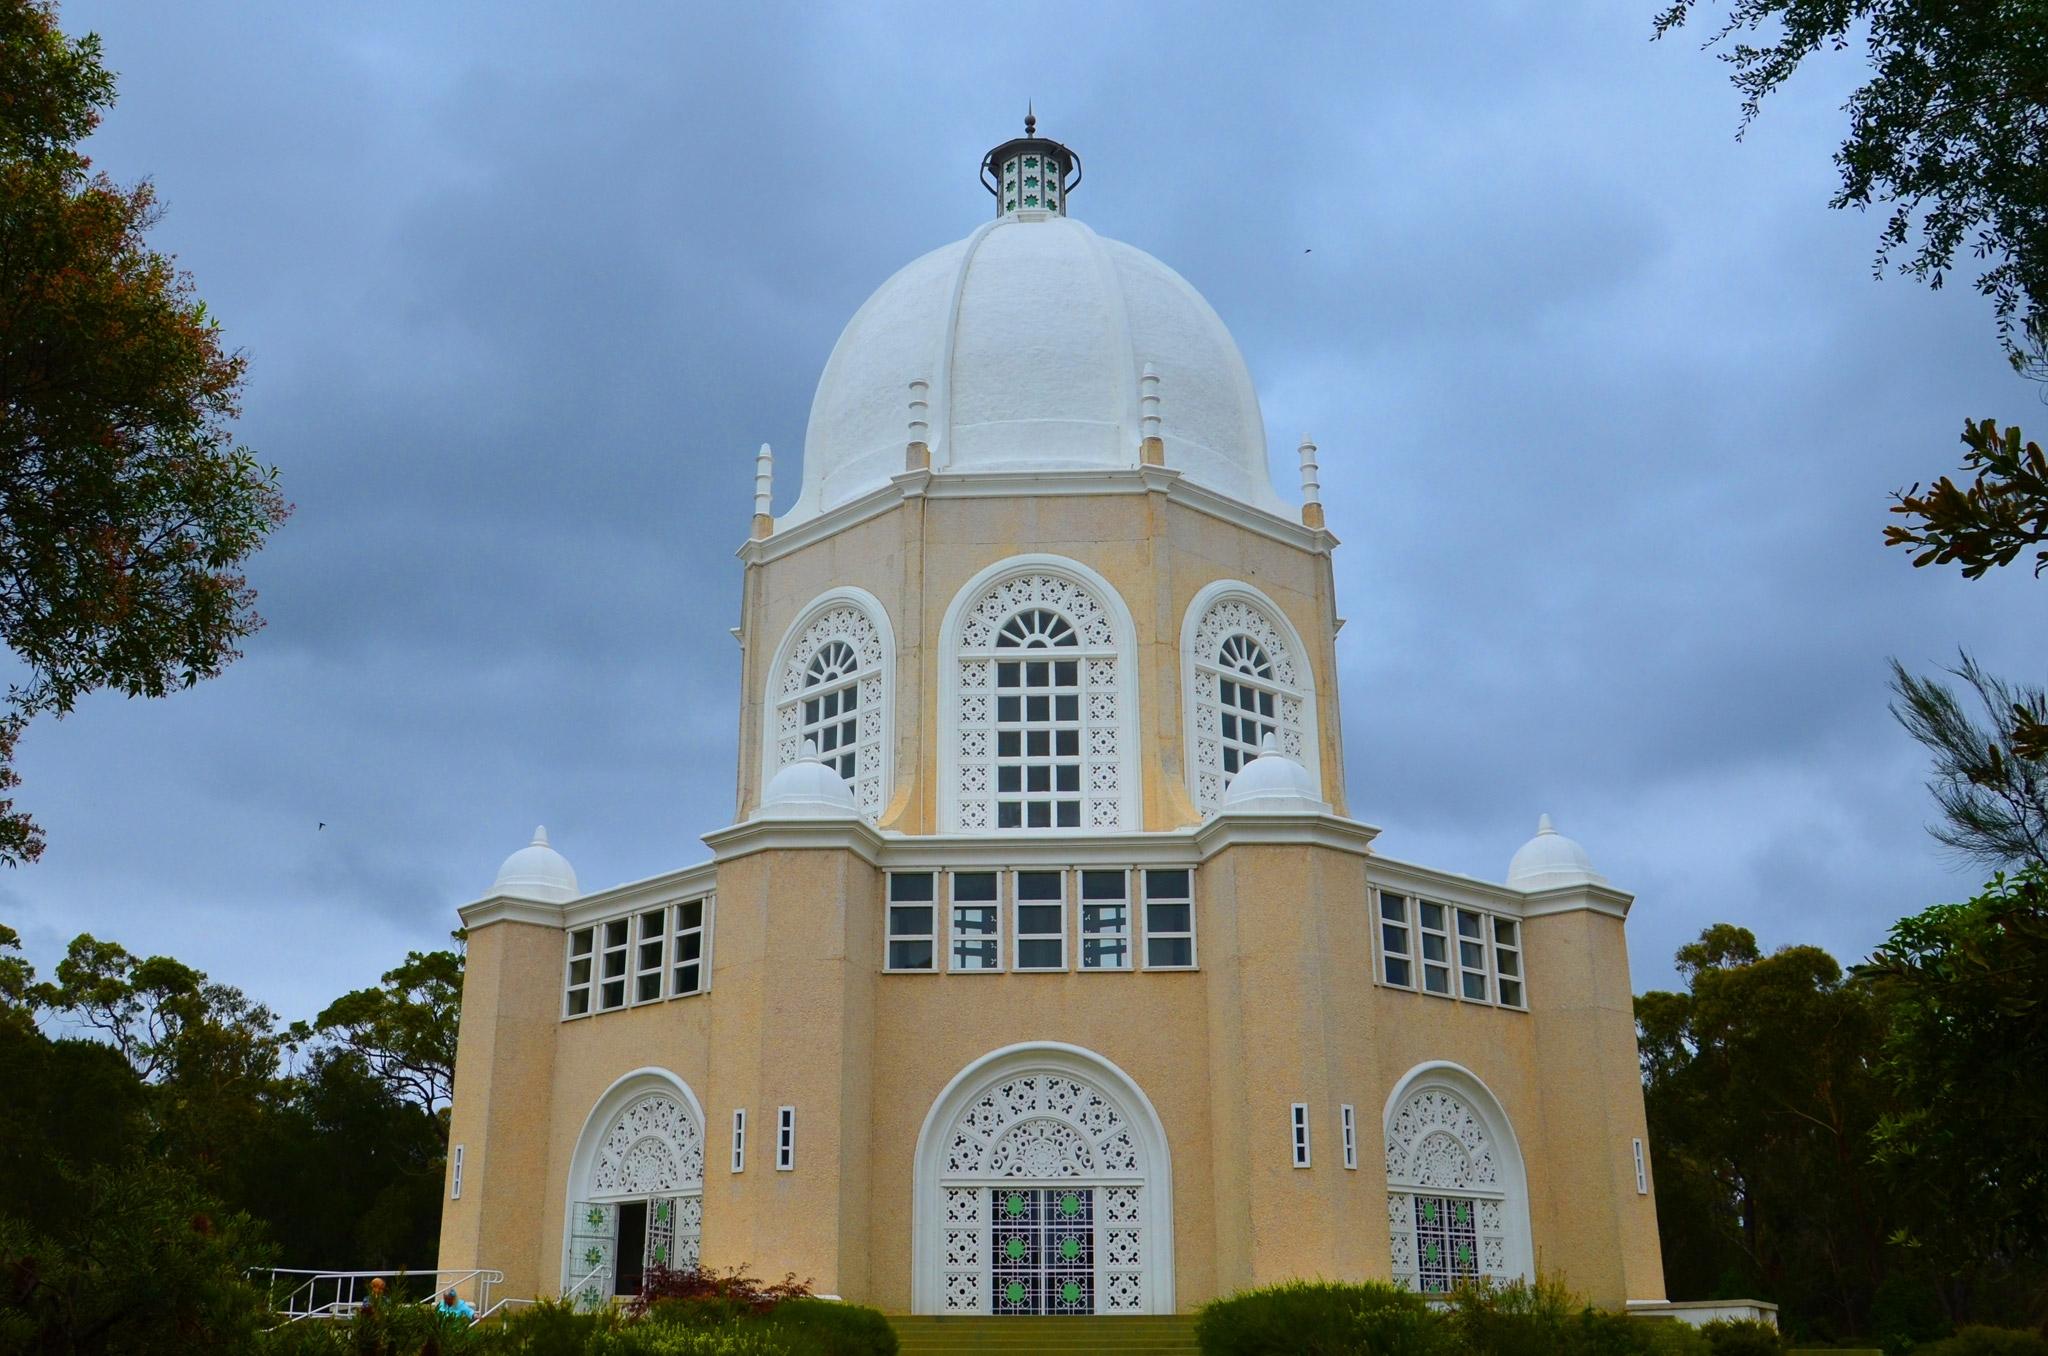 Bahai Temple - Image �2014 ManlyAustralia.com